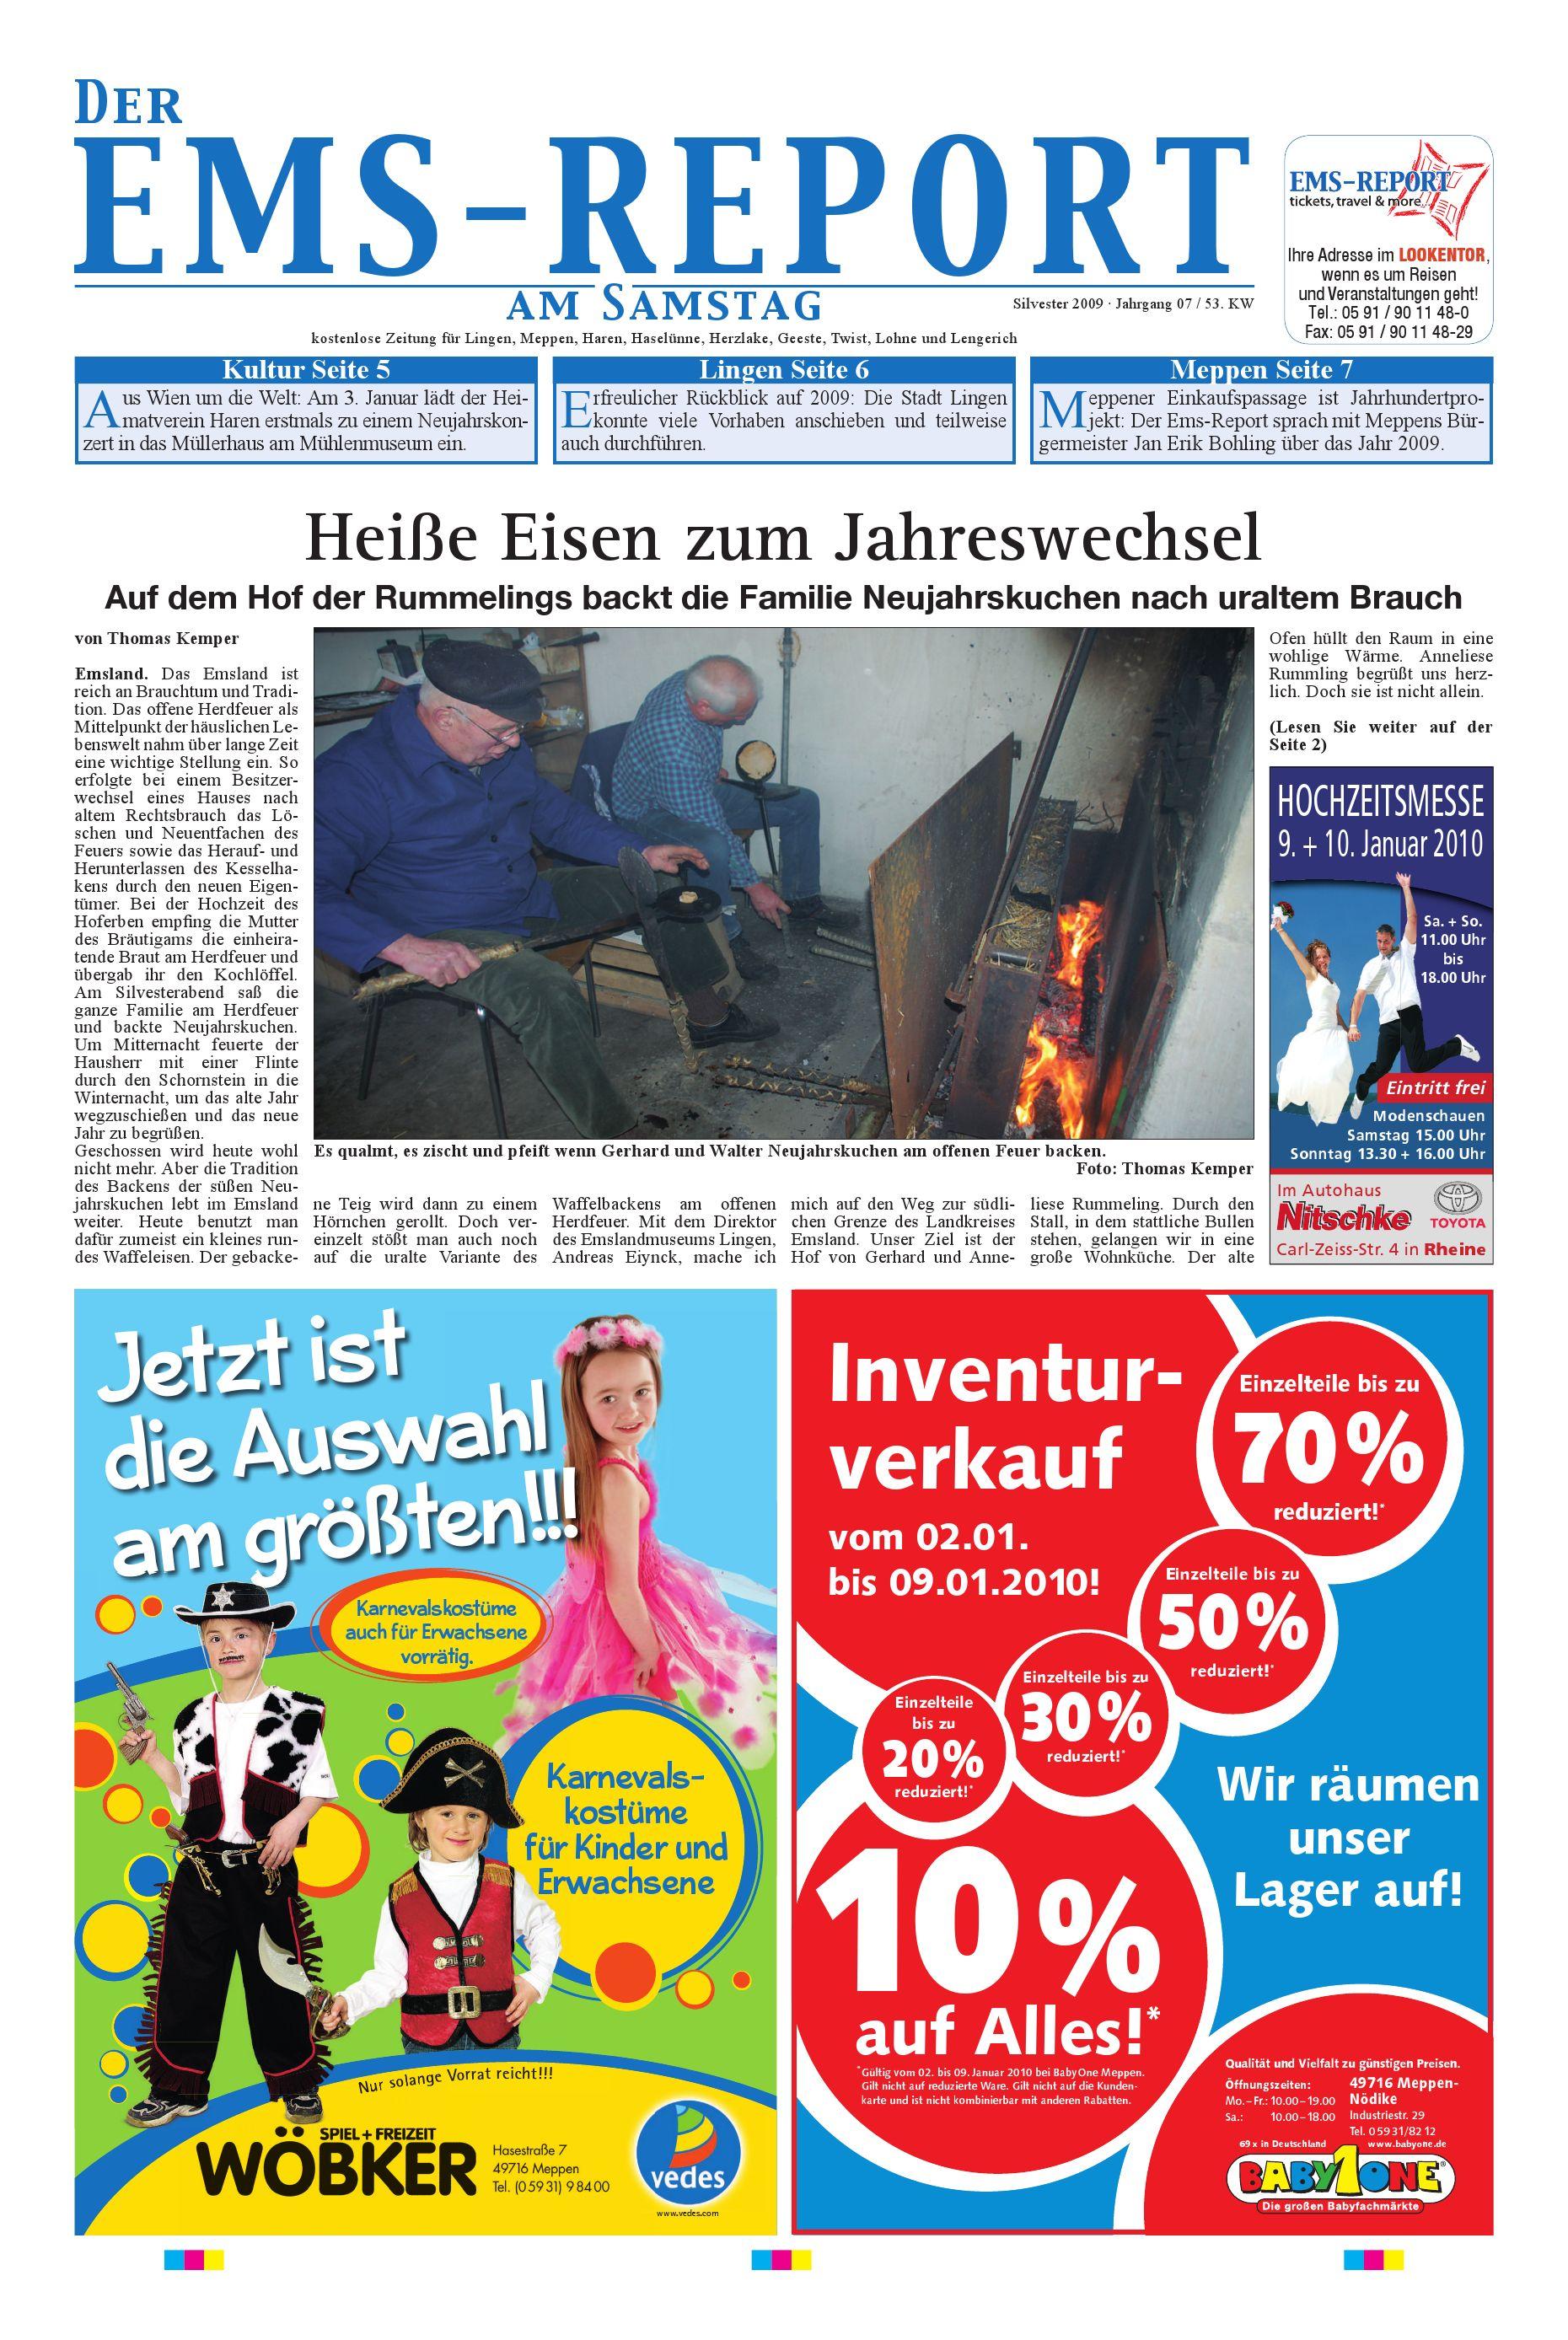 Der Ems-Report Ausgabe Online KW53/09 by Ems-Report GmbH & Co. KG ...